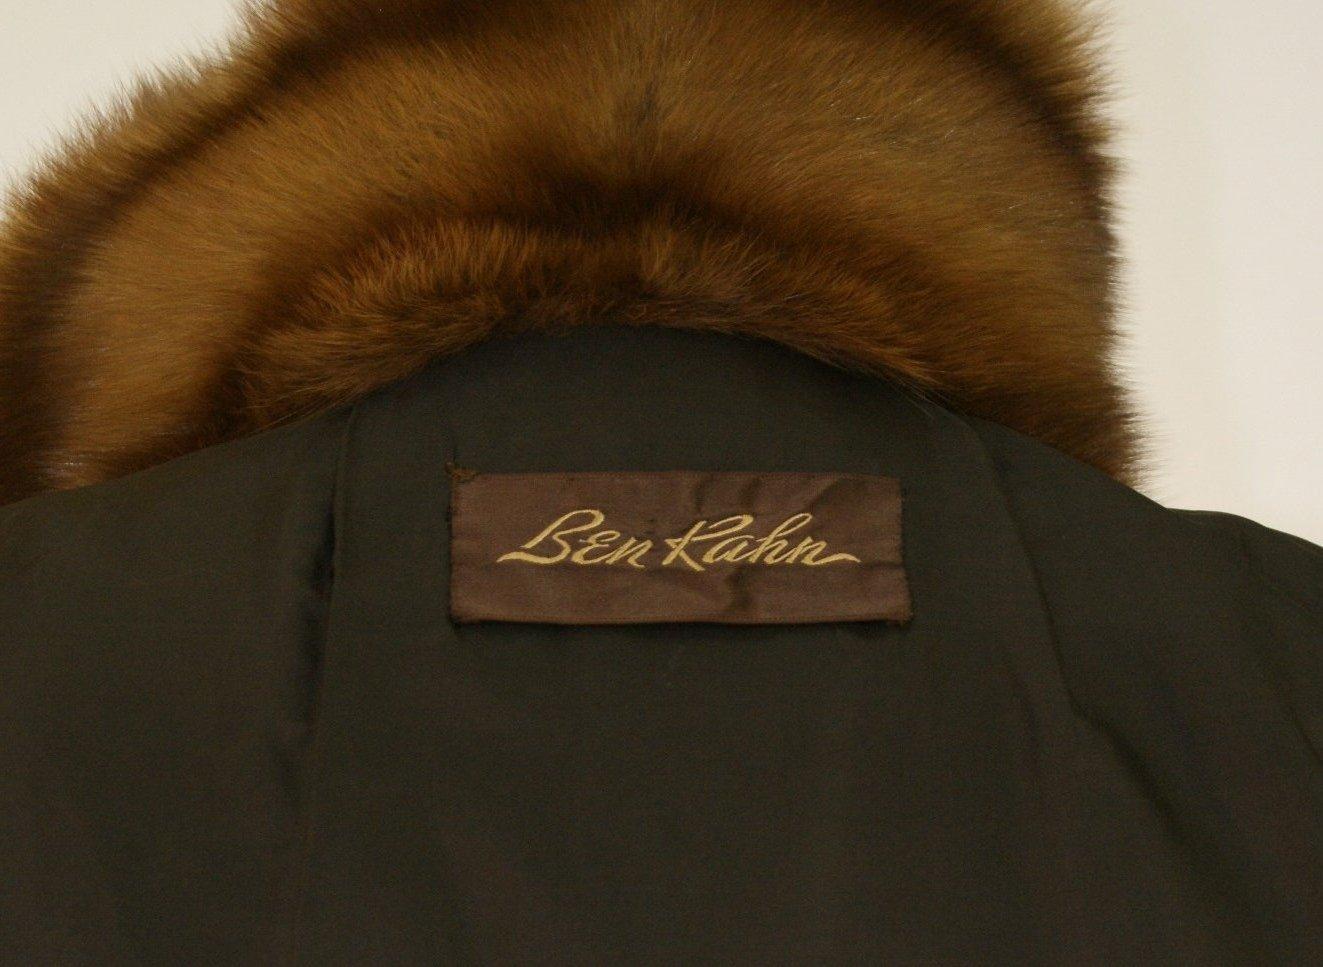 Ben Kahn Russian Sable 3/4 Coat Used 07